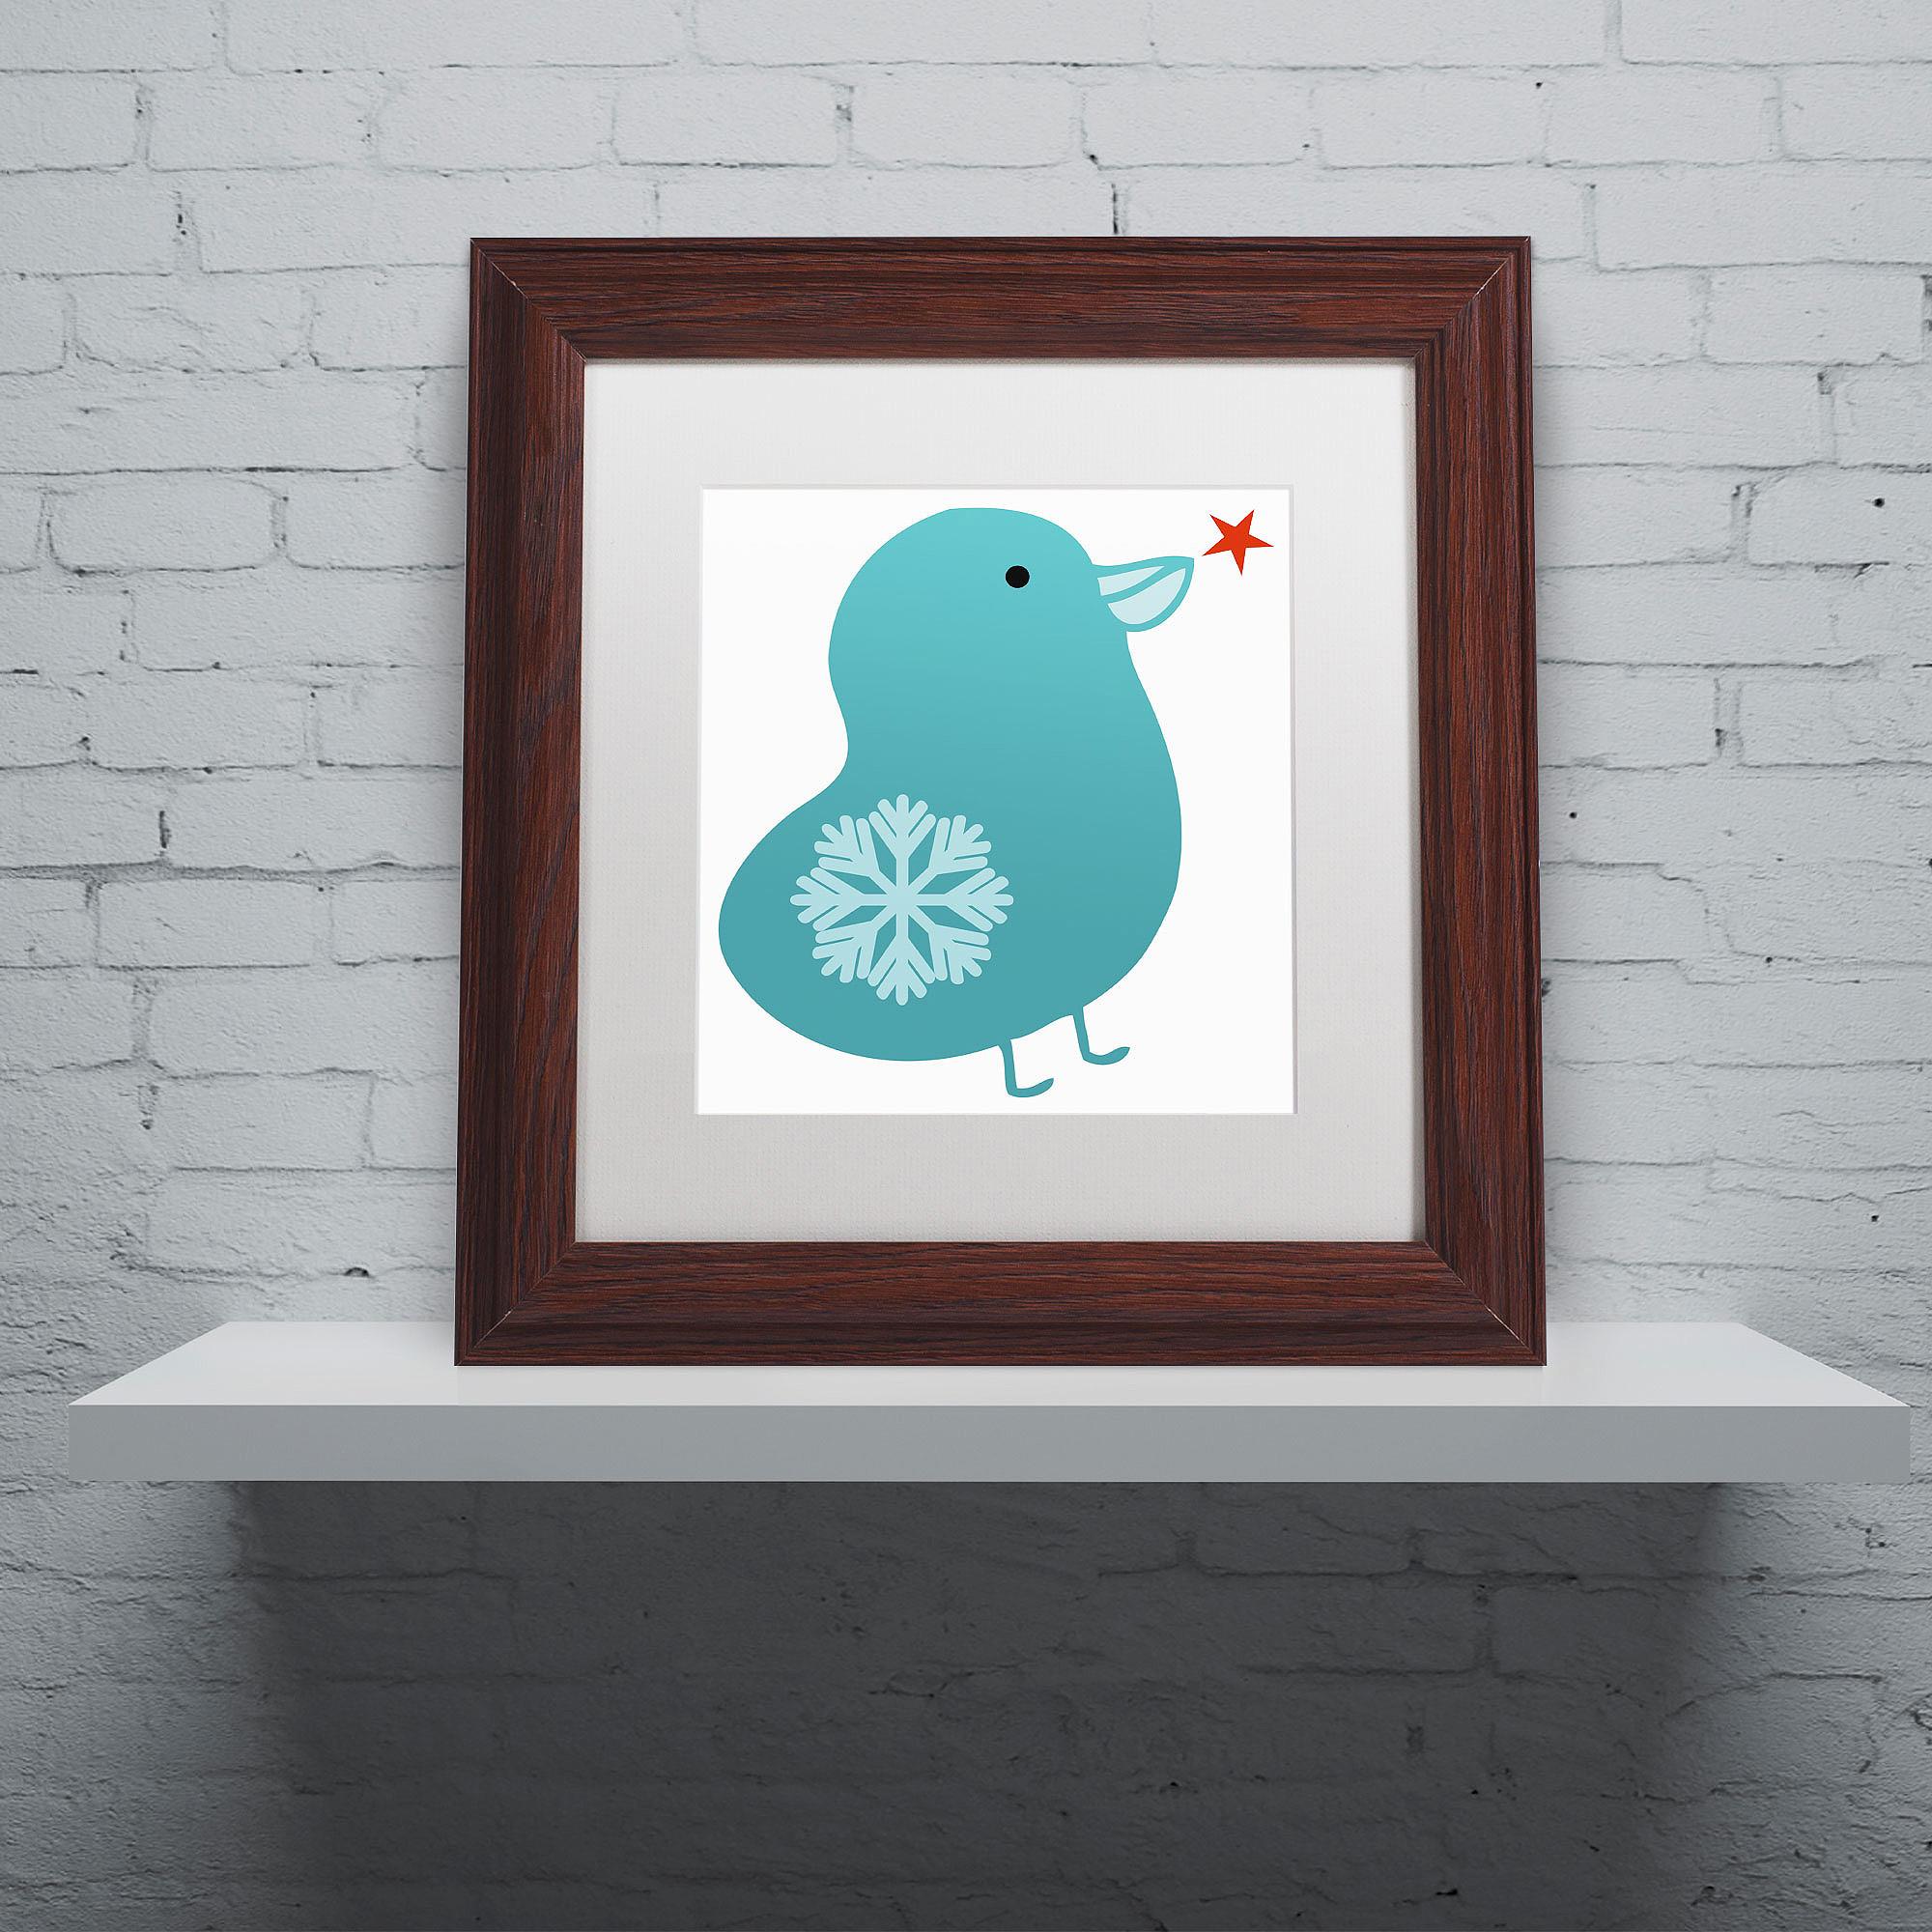 "Trademark Fine Art ""Snowflake Bird"" Canvas Art by Carla Martell, White Matte, Wood Frame"